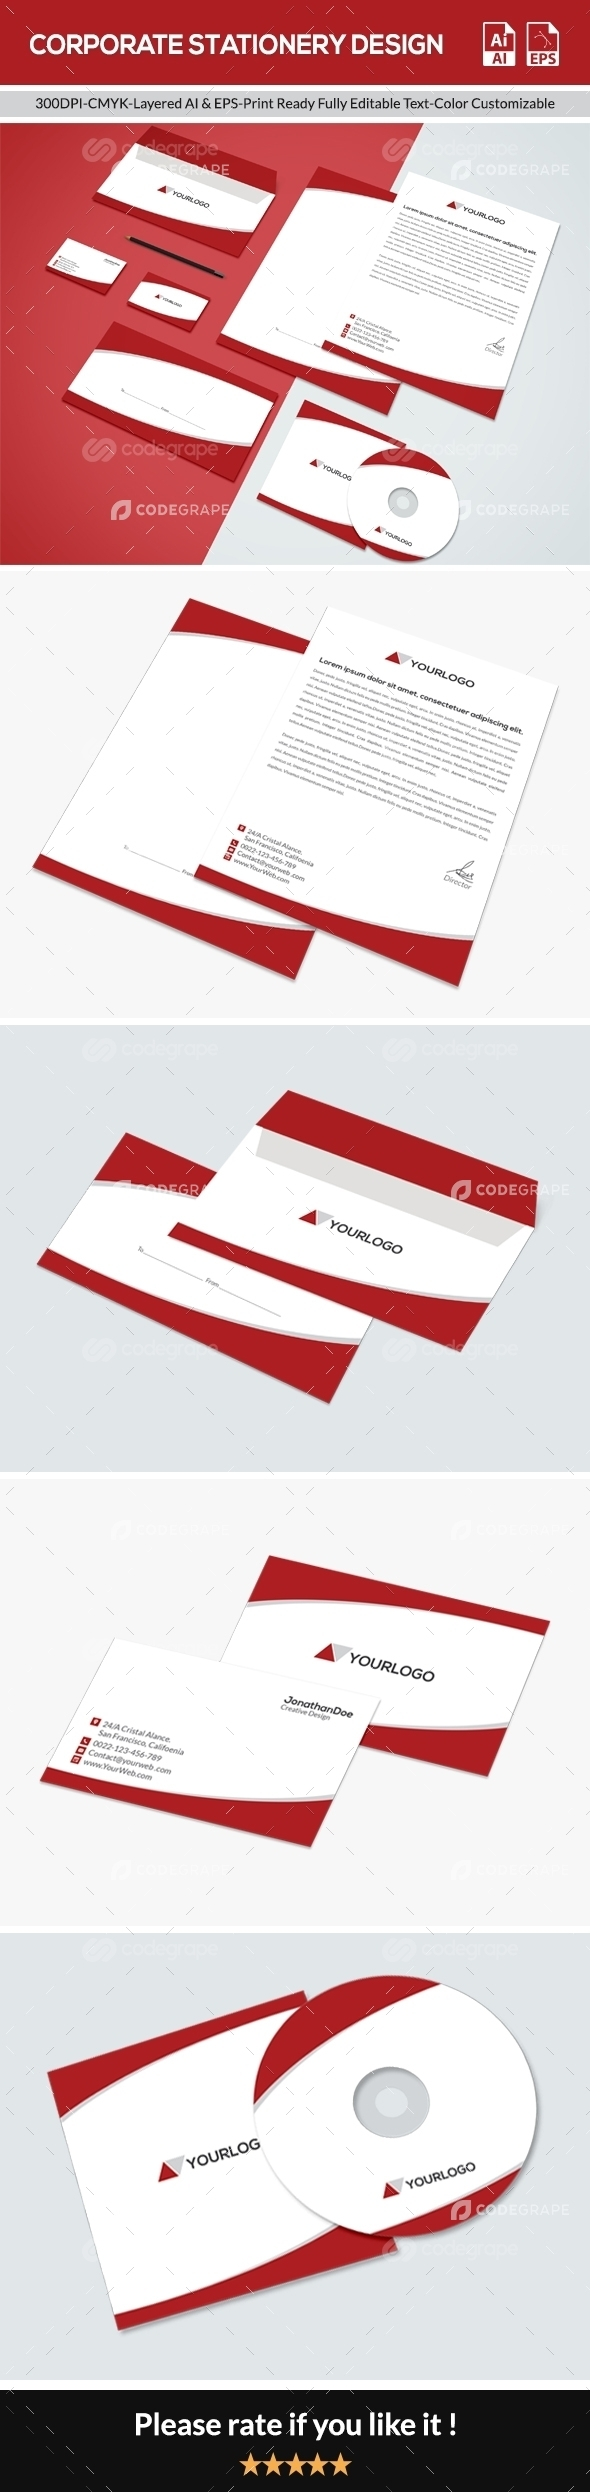 Flat Corporate Stationery Design